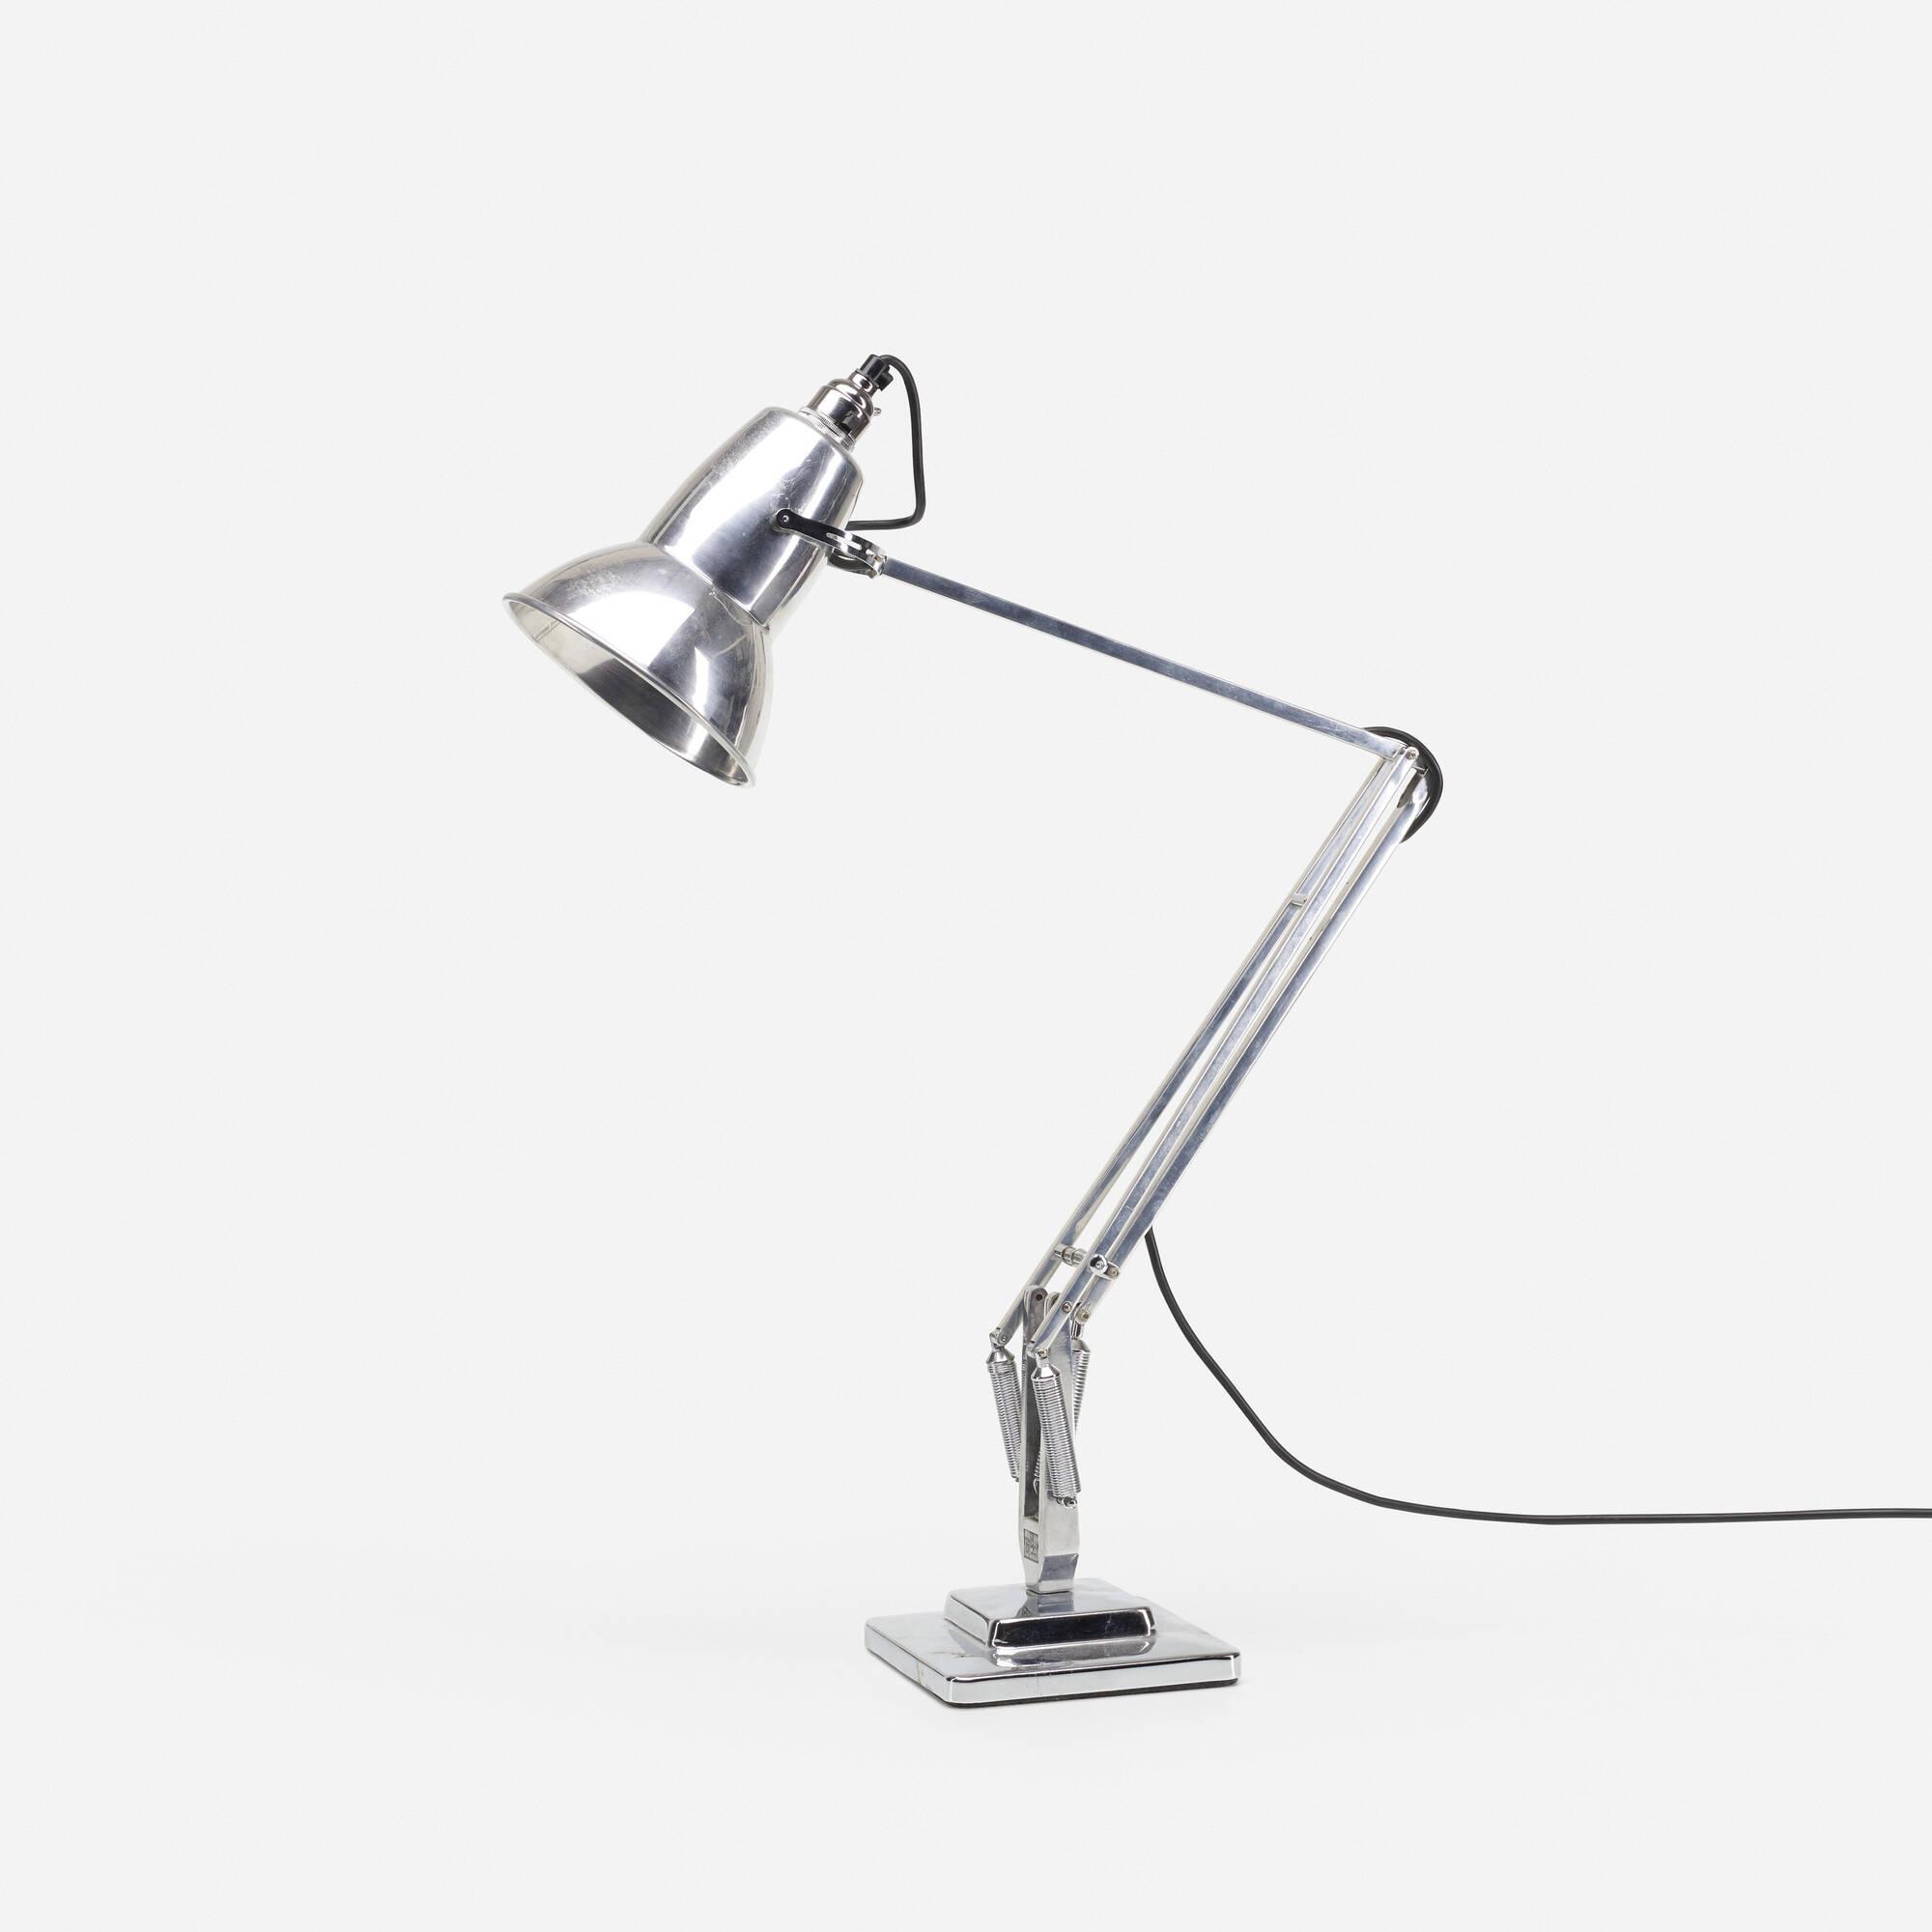 281: George Carwardine / Anglepoise Lamp (1 Of 1)